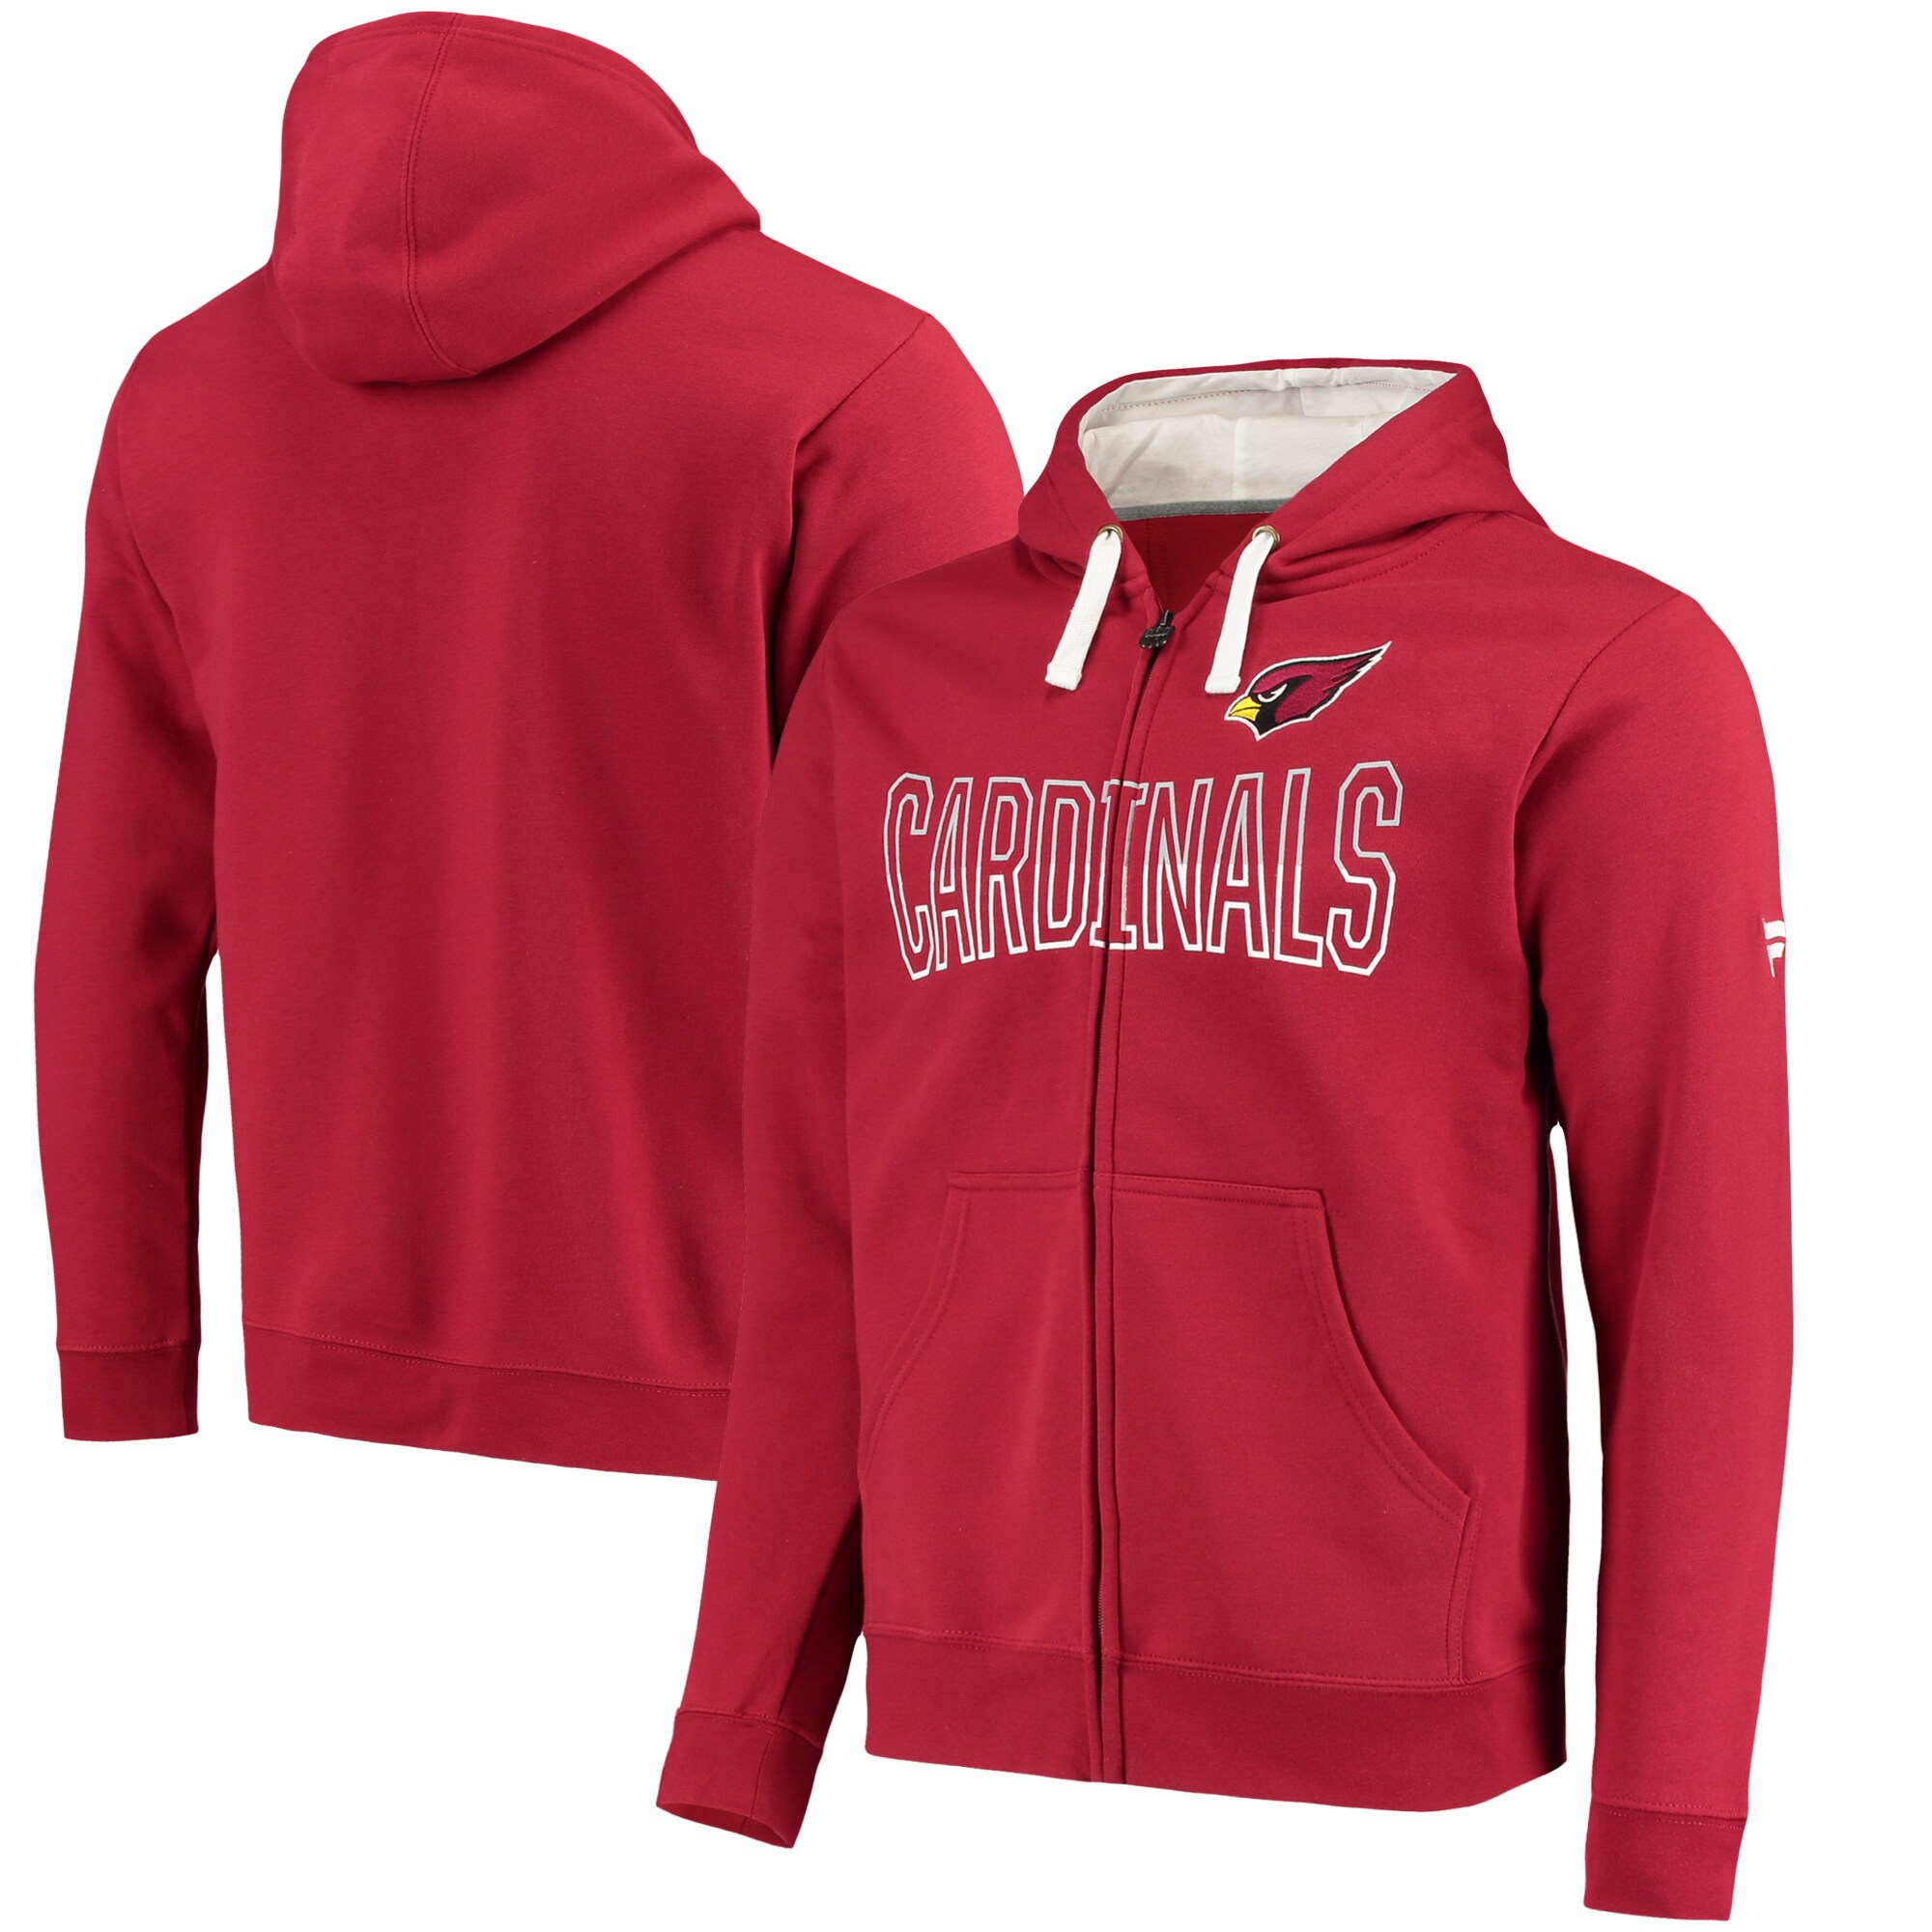 Arizona Cardinals NFL Pro Line by Fanatics Branded Iconic Fleece Full-Zip Hoodie - Cardinal